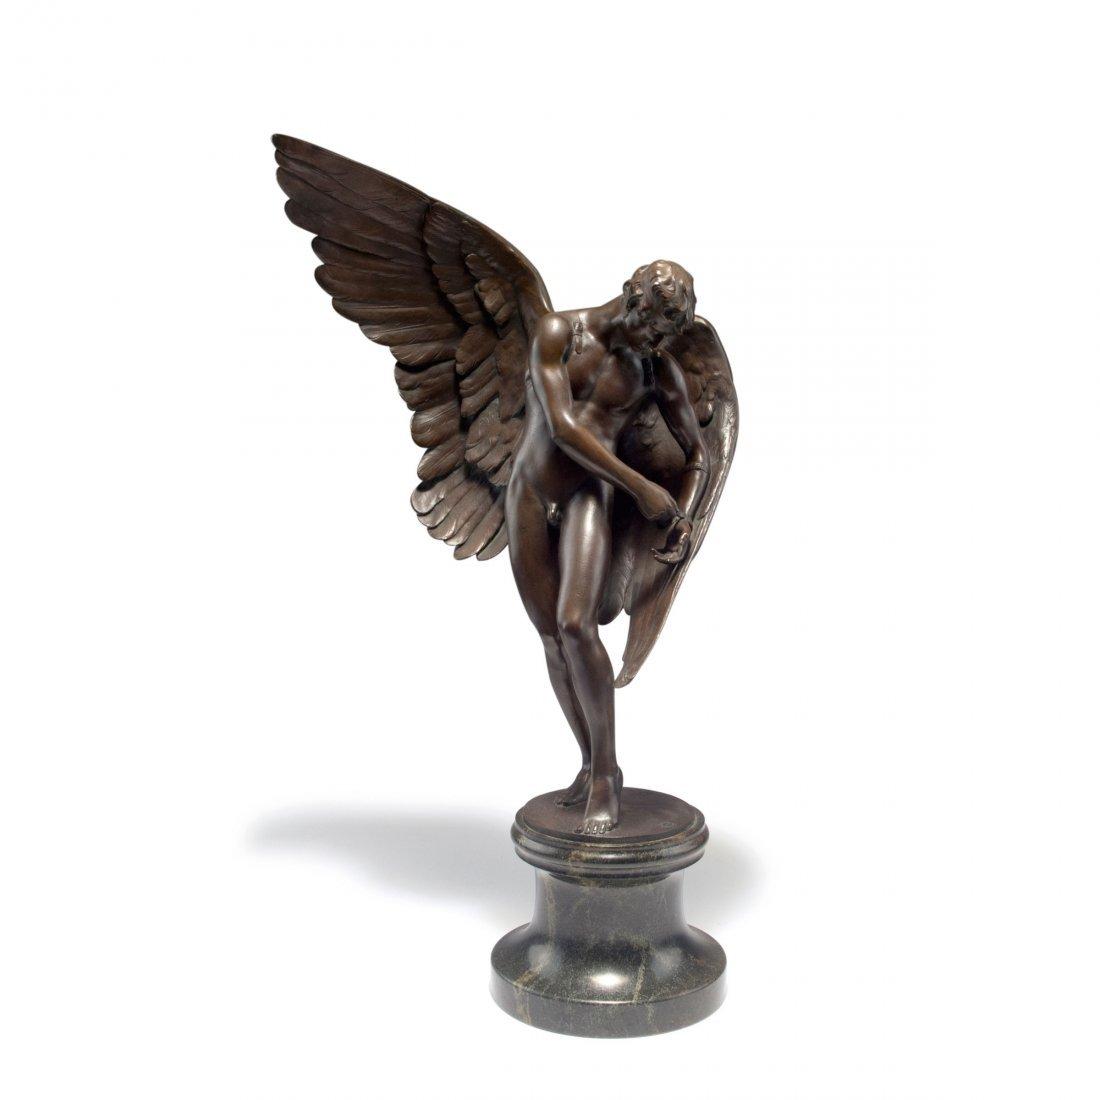 'Icarus', 1895